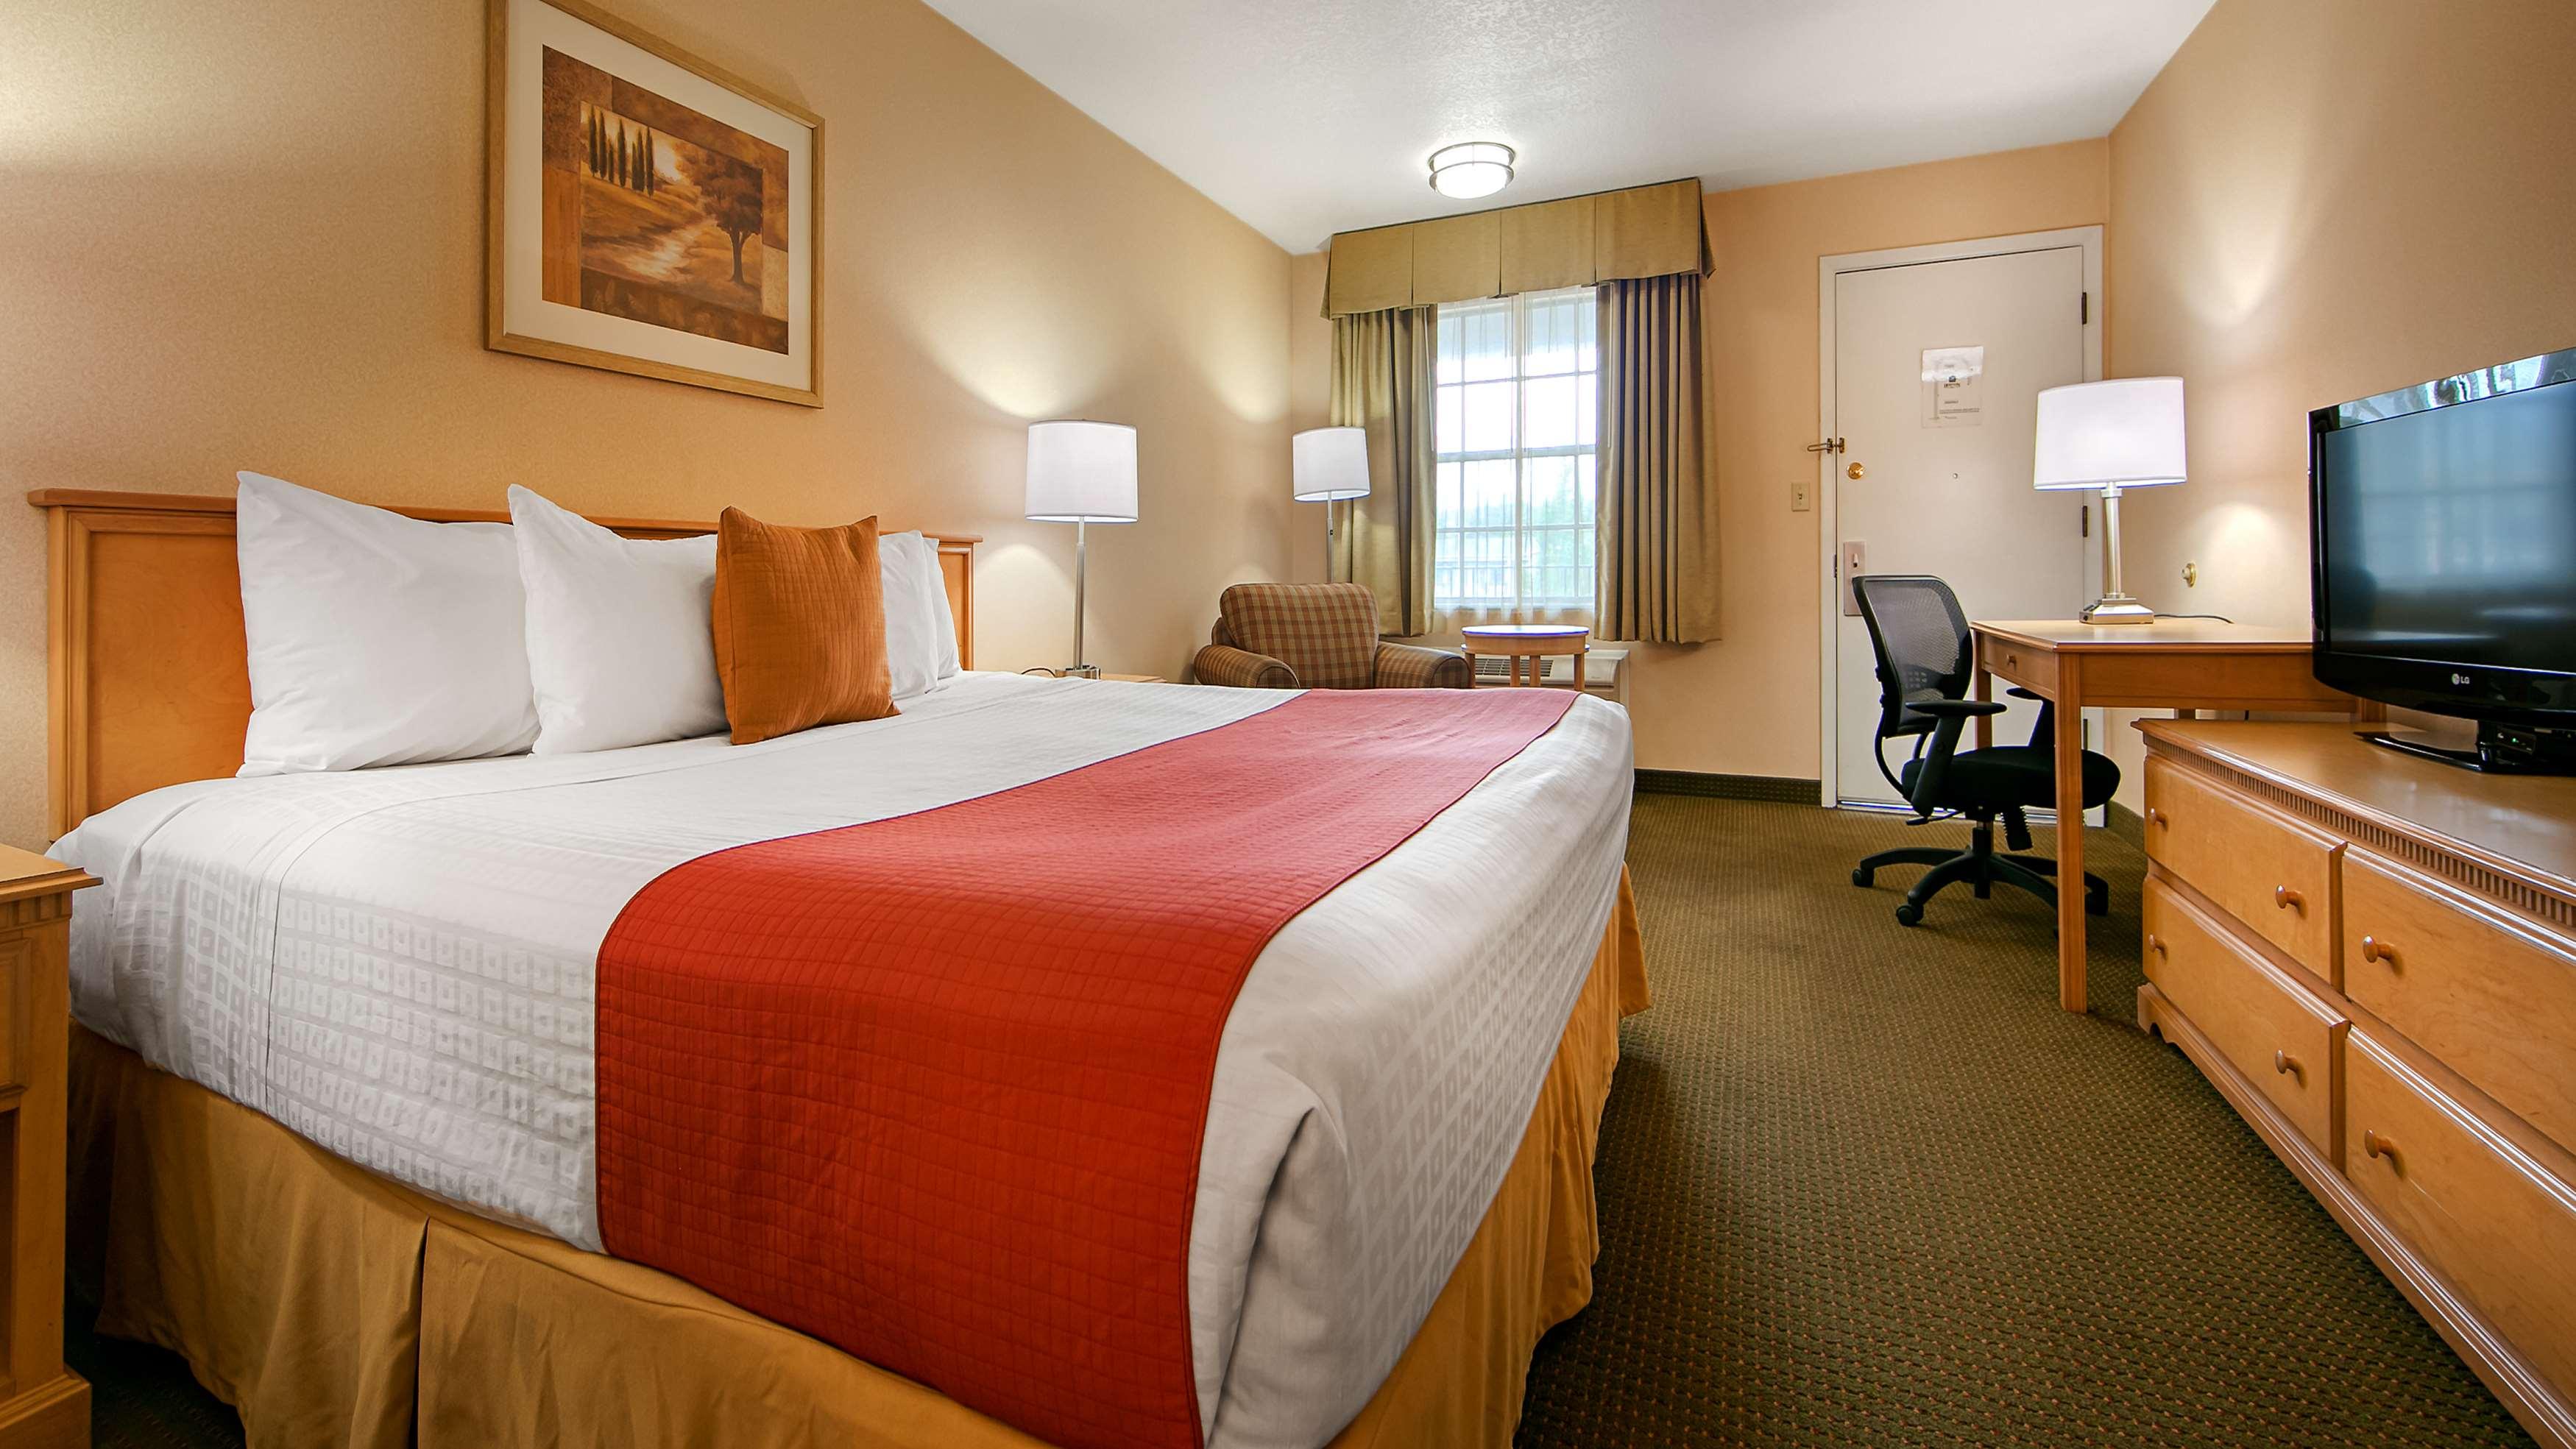 Best Western Horizon Inn image 29